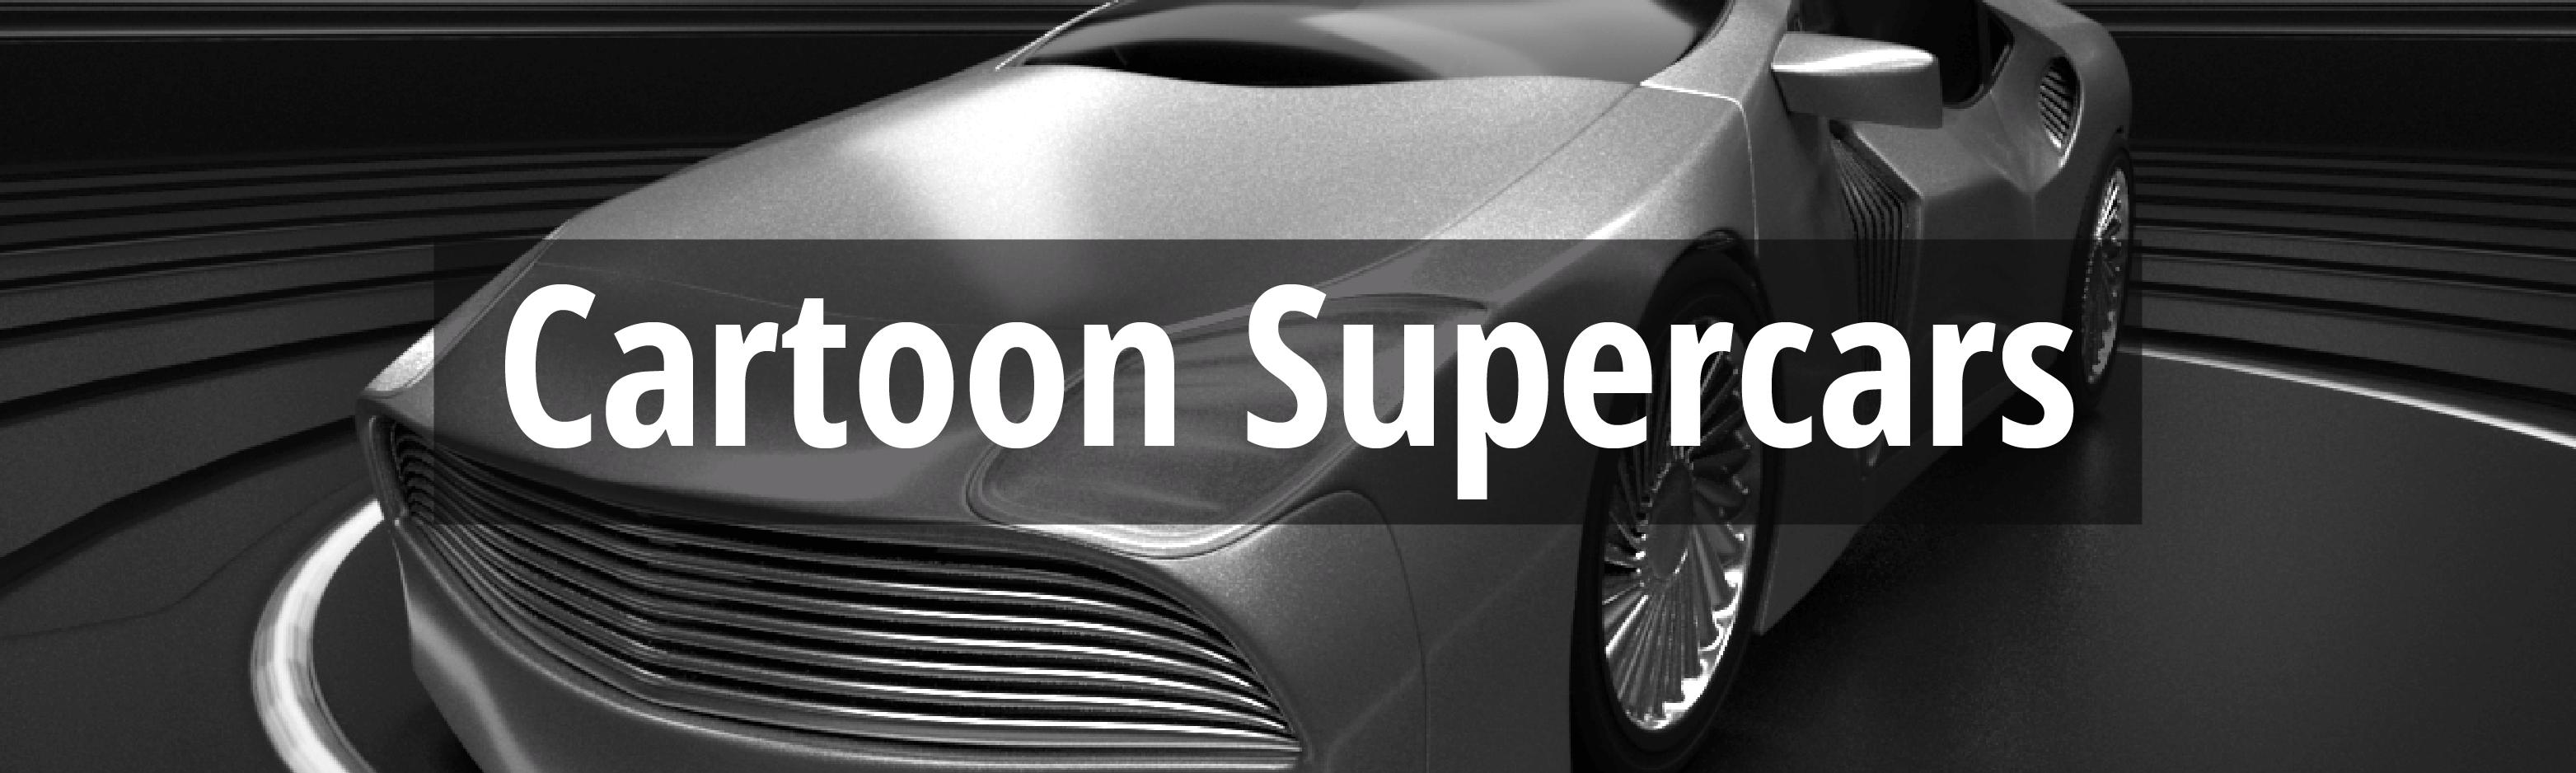 Cartoon Supercars desktop